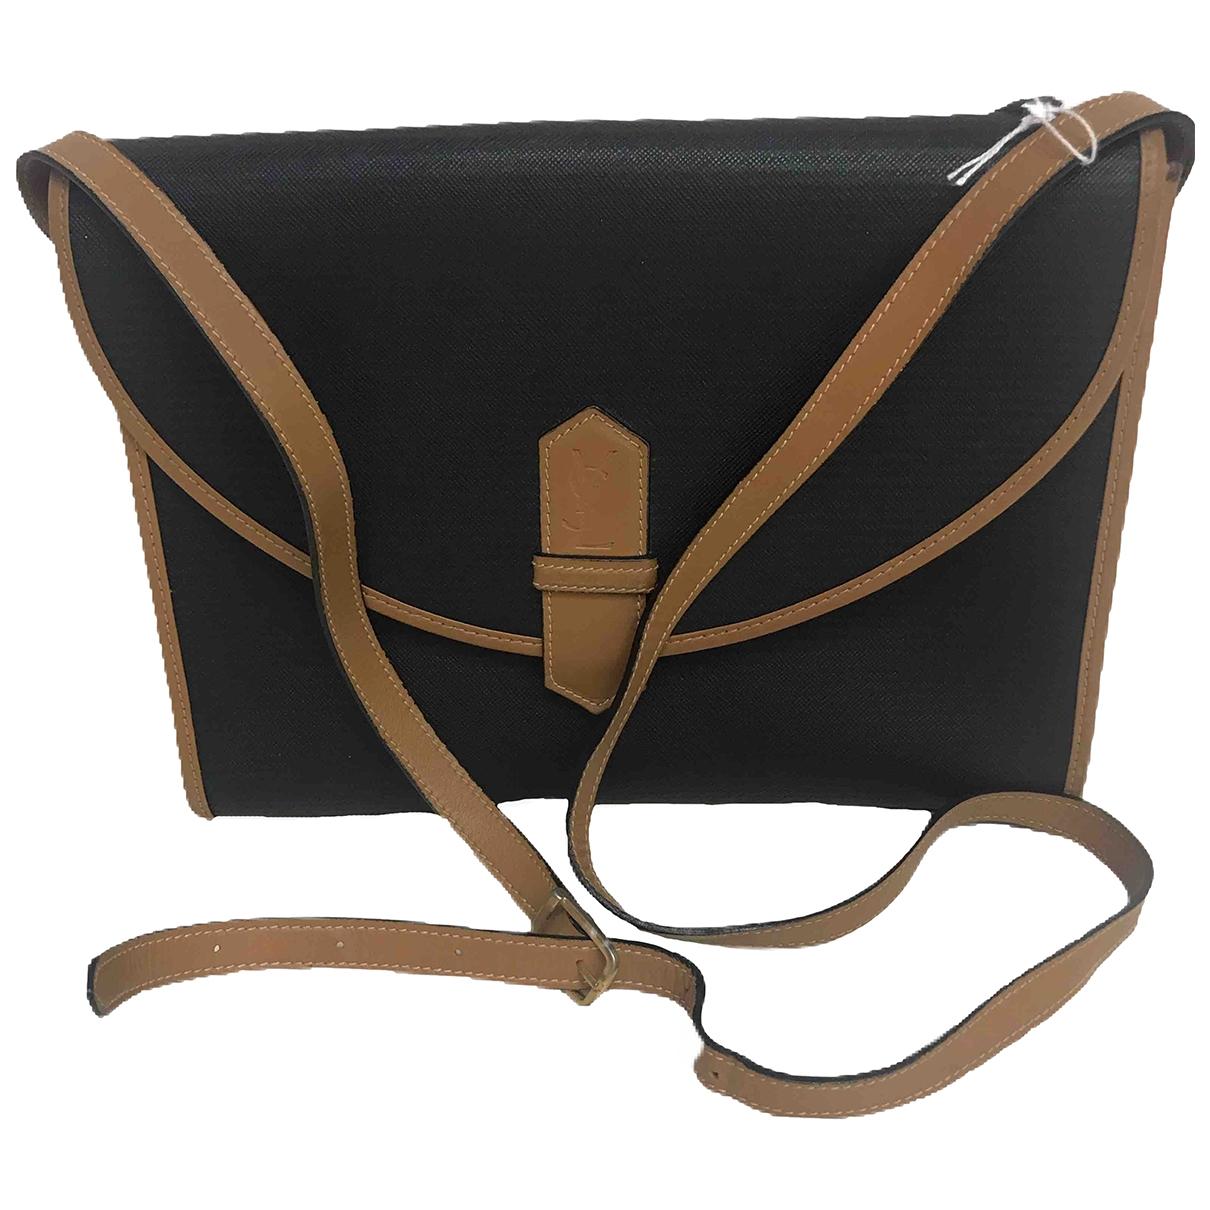 Yves Saint Laurent \N Black Cloth handbag for Women \N